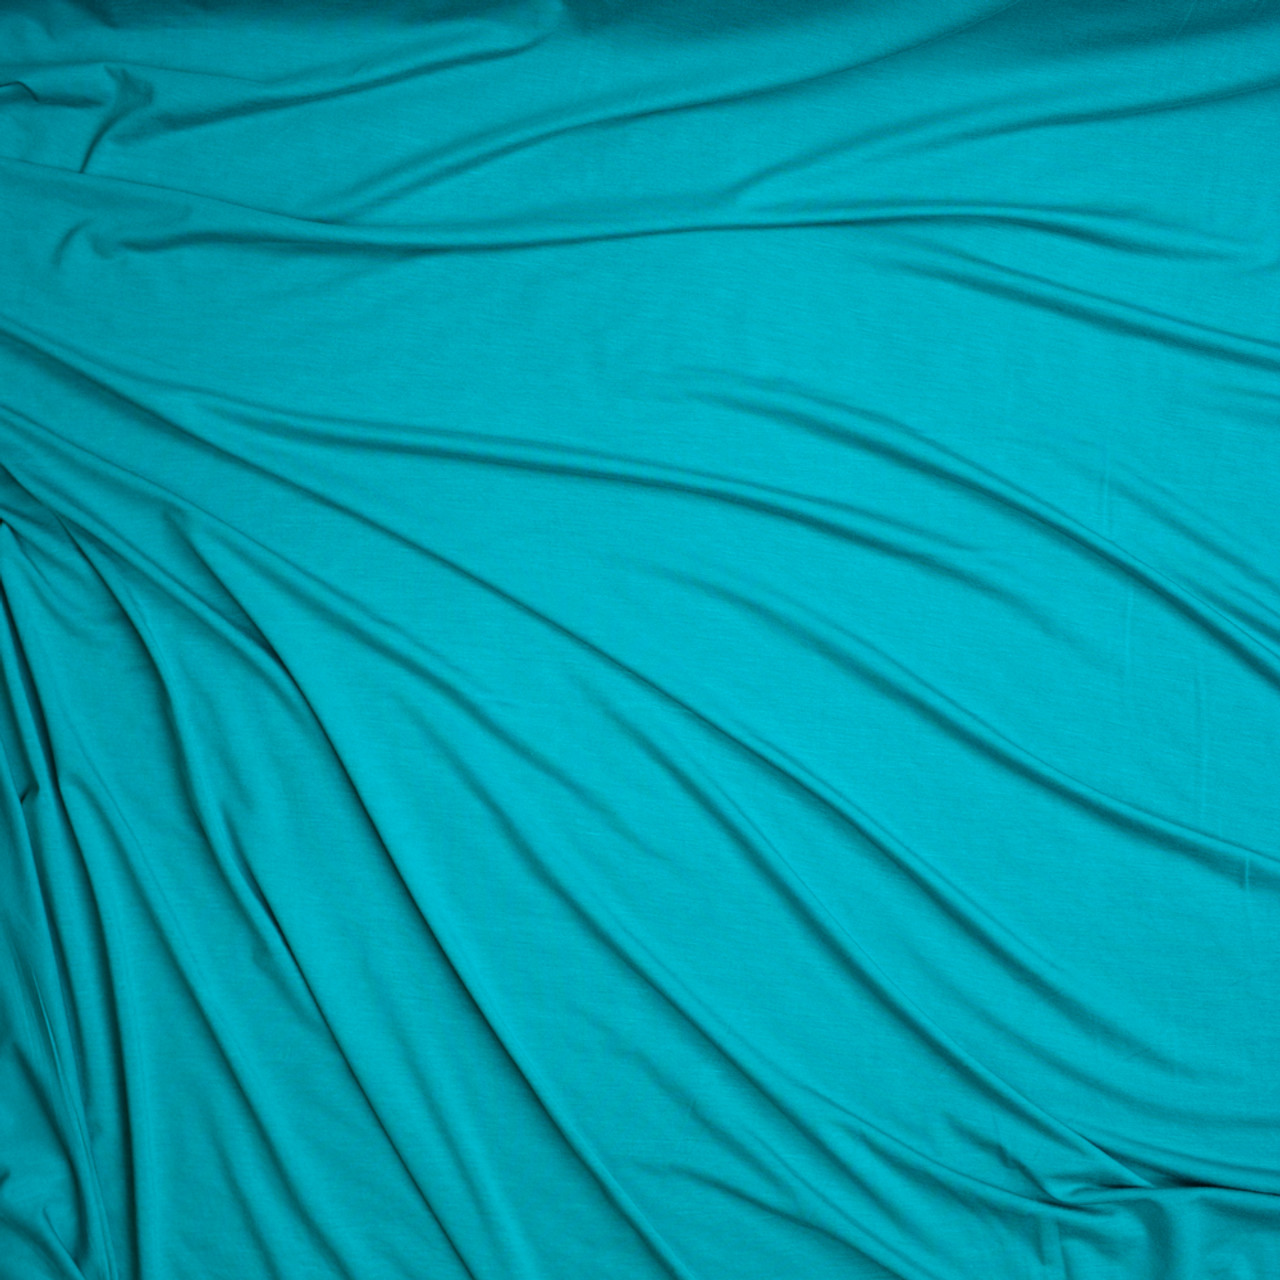 c56d96eb7f1 ... Aqua Stretch Modal Jersey Knit Fabric By The Yard - Wide shot